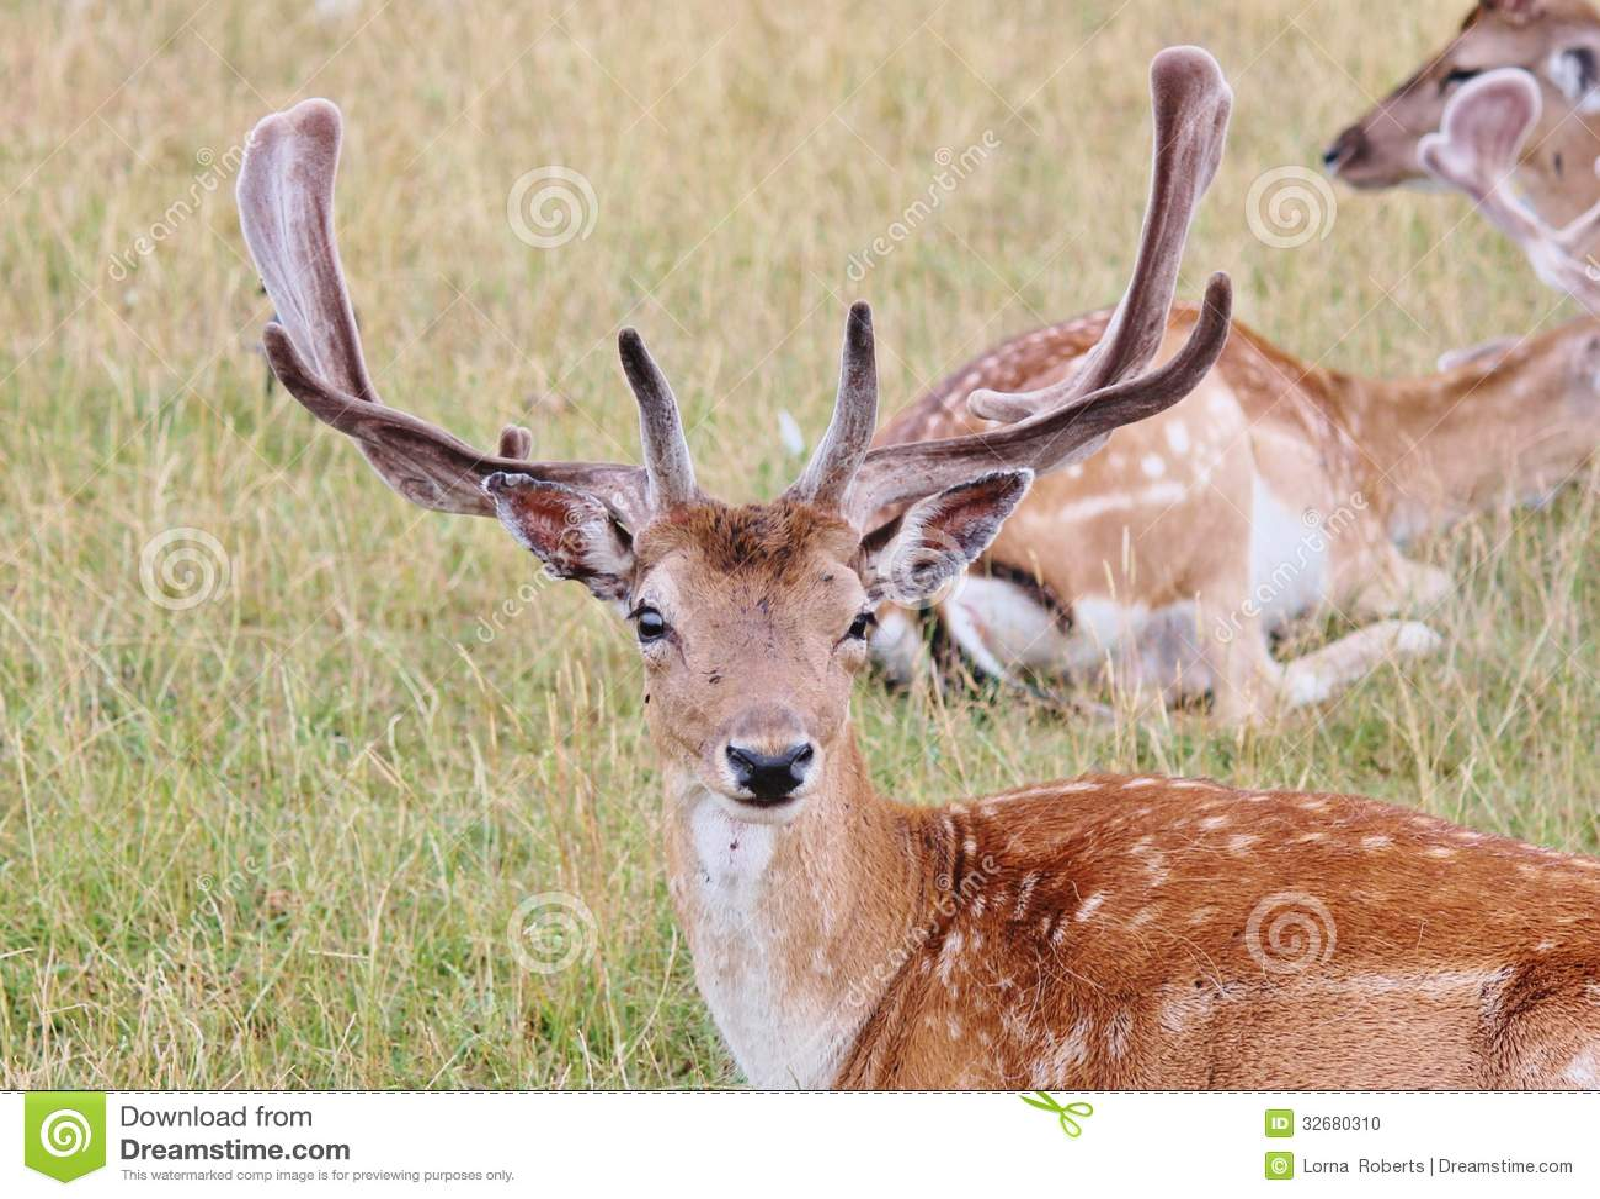 red deer dating singles In the category personals red deer you can find 17 personals ads, eg: friendship, women seeking men or men seeking women.